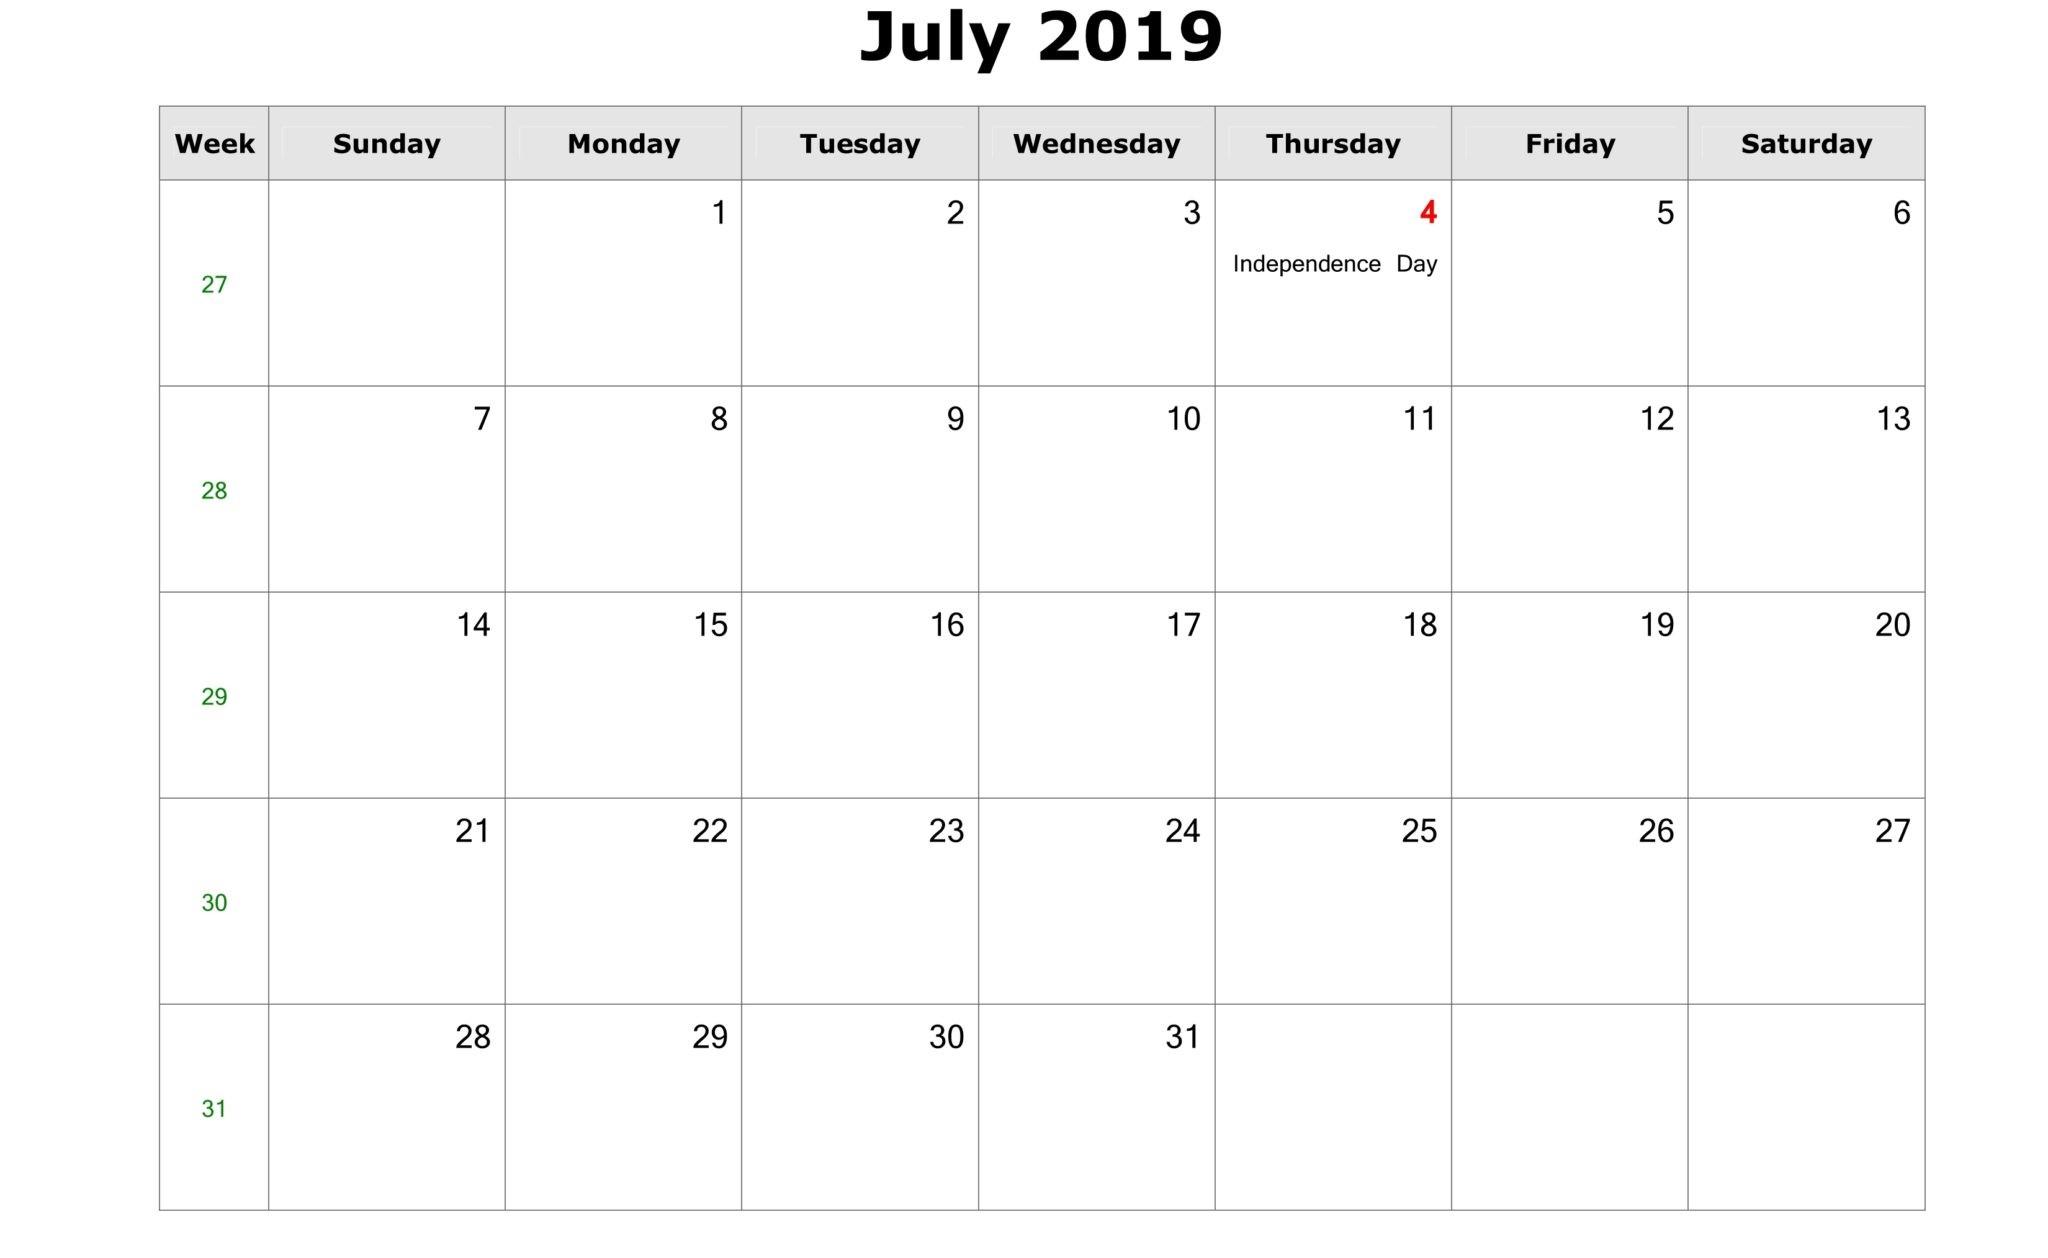 July 2019 Calendar With Holidays UK